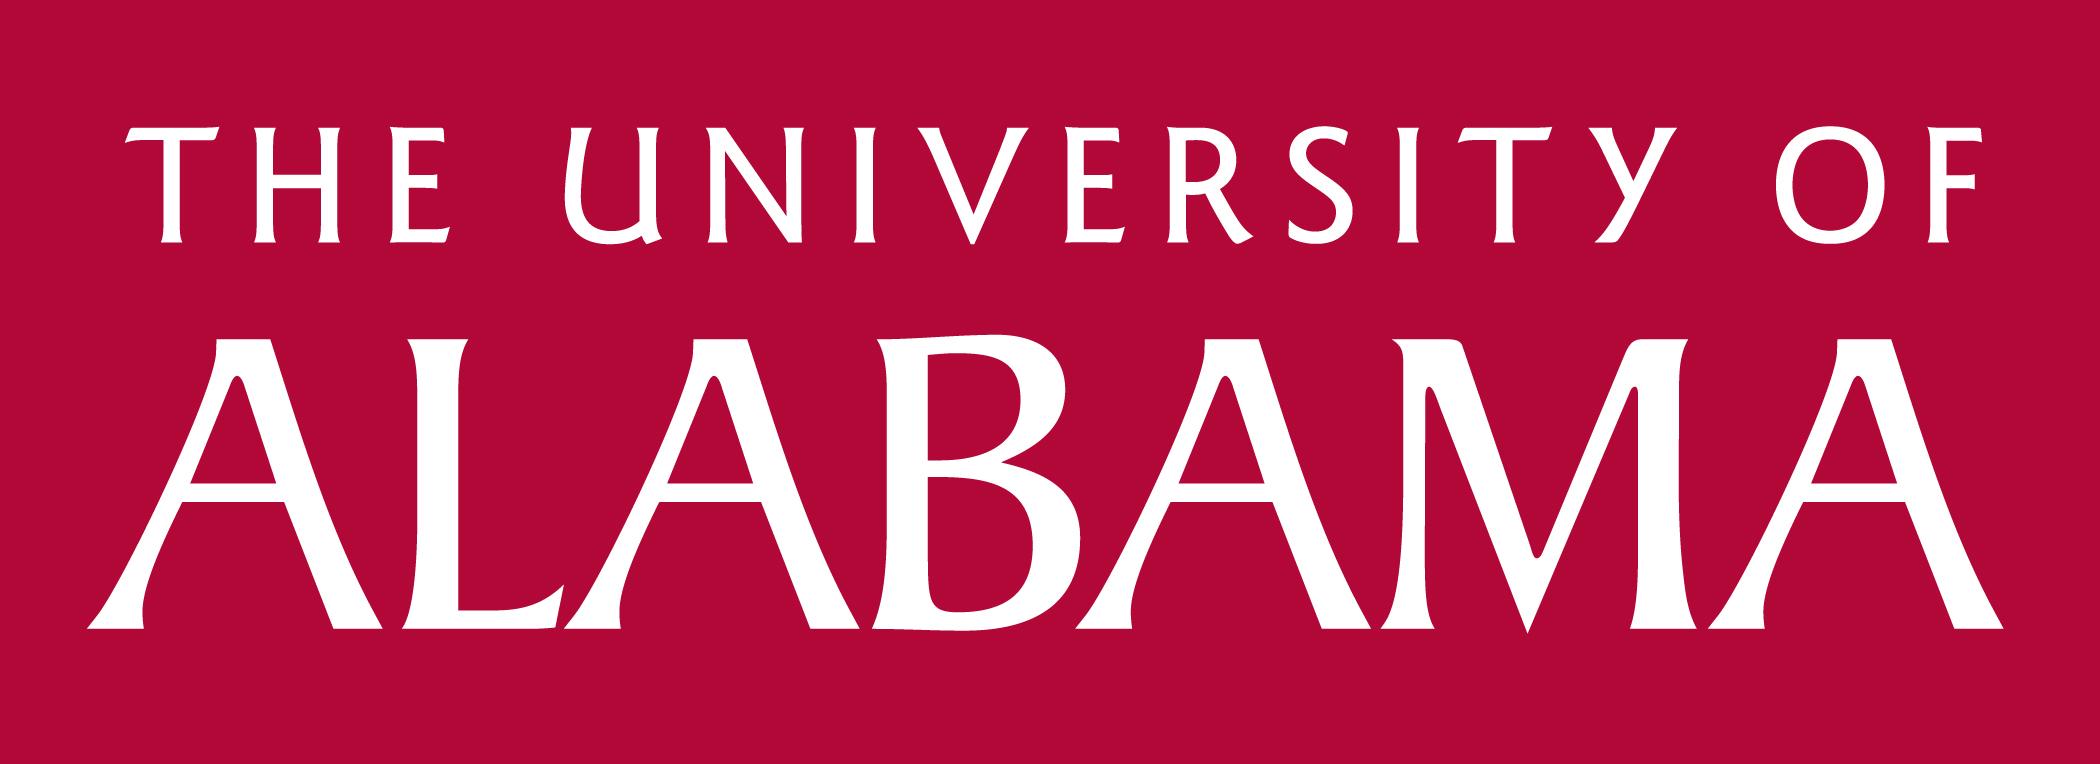 University-of-Alabama-logo.jpg